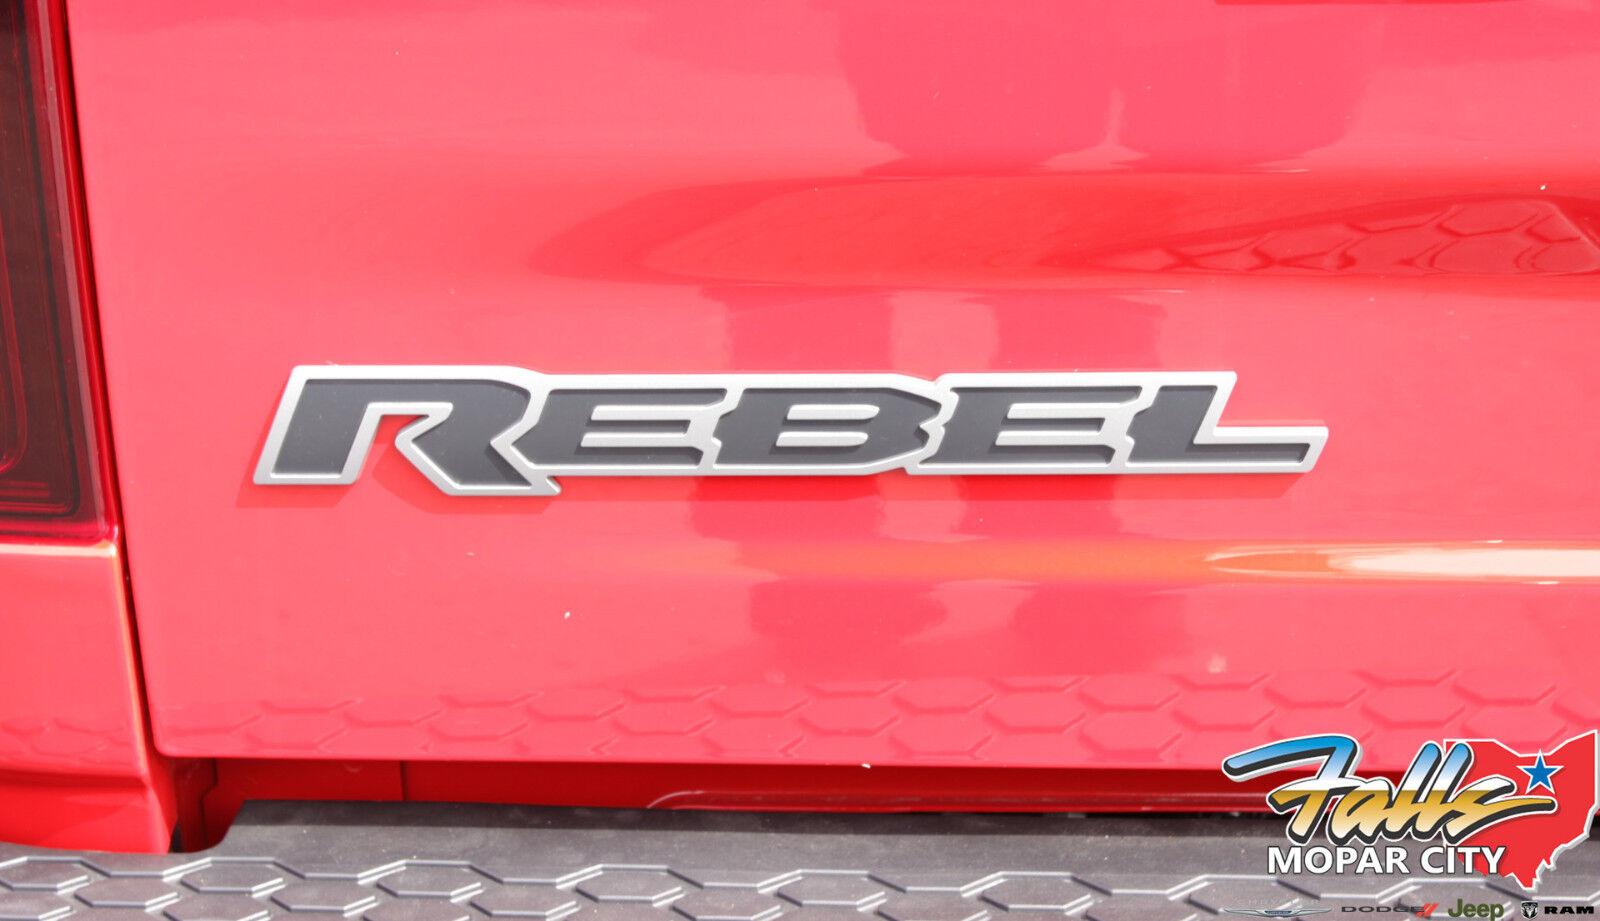 Ram 1500 Rebel >> Dodge Ram REBEL Tailgate Decal Emblem Nameplate Mopar OEM ...